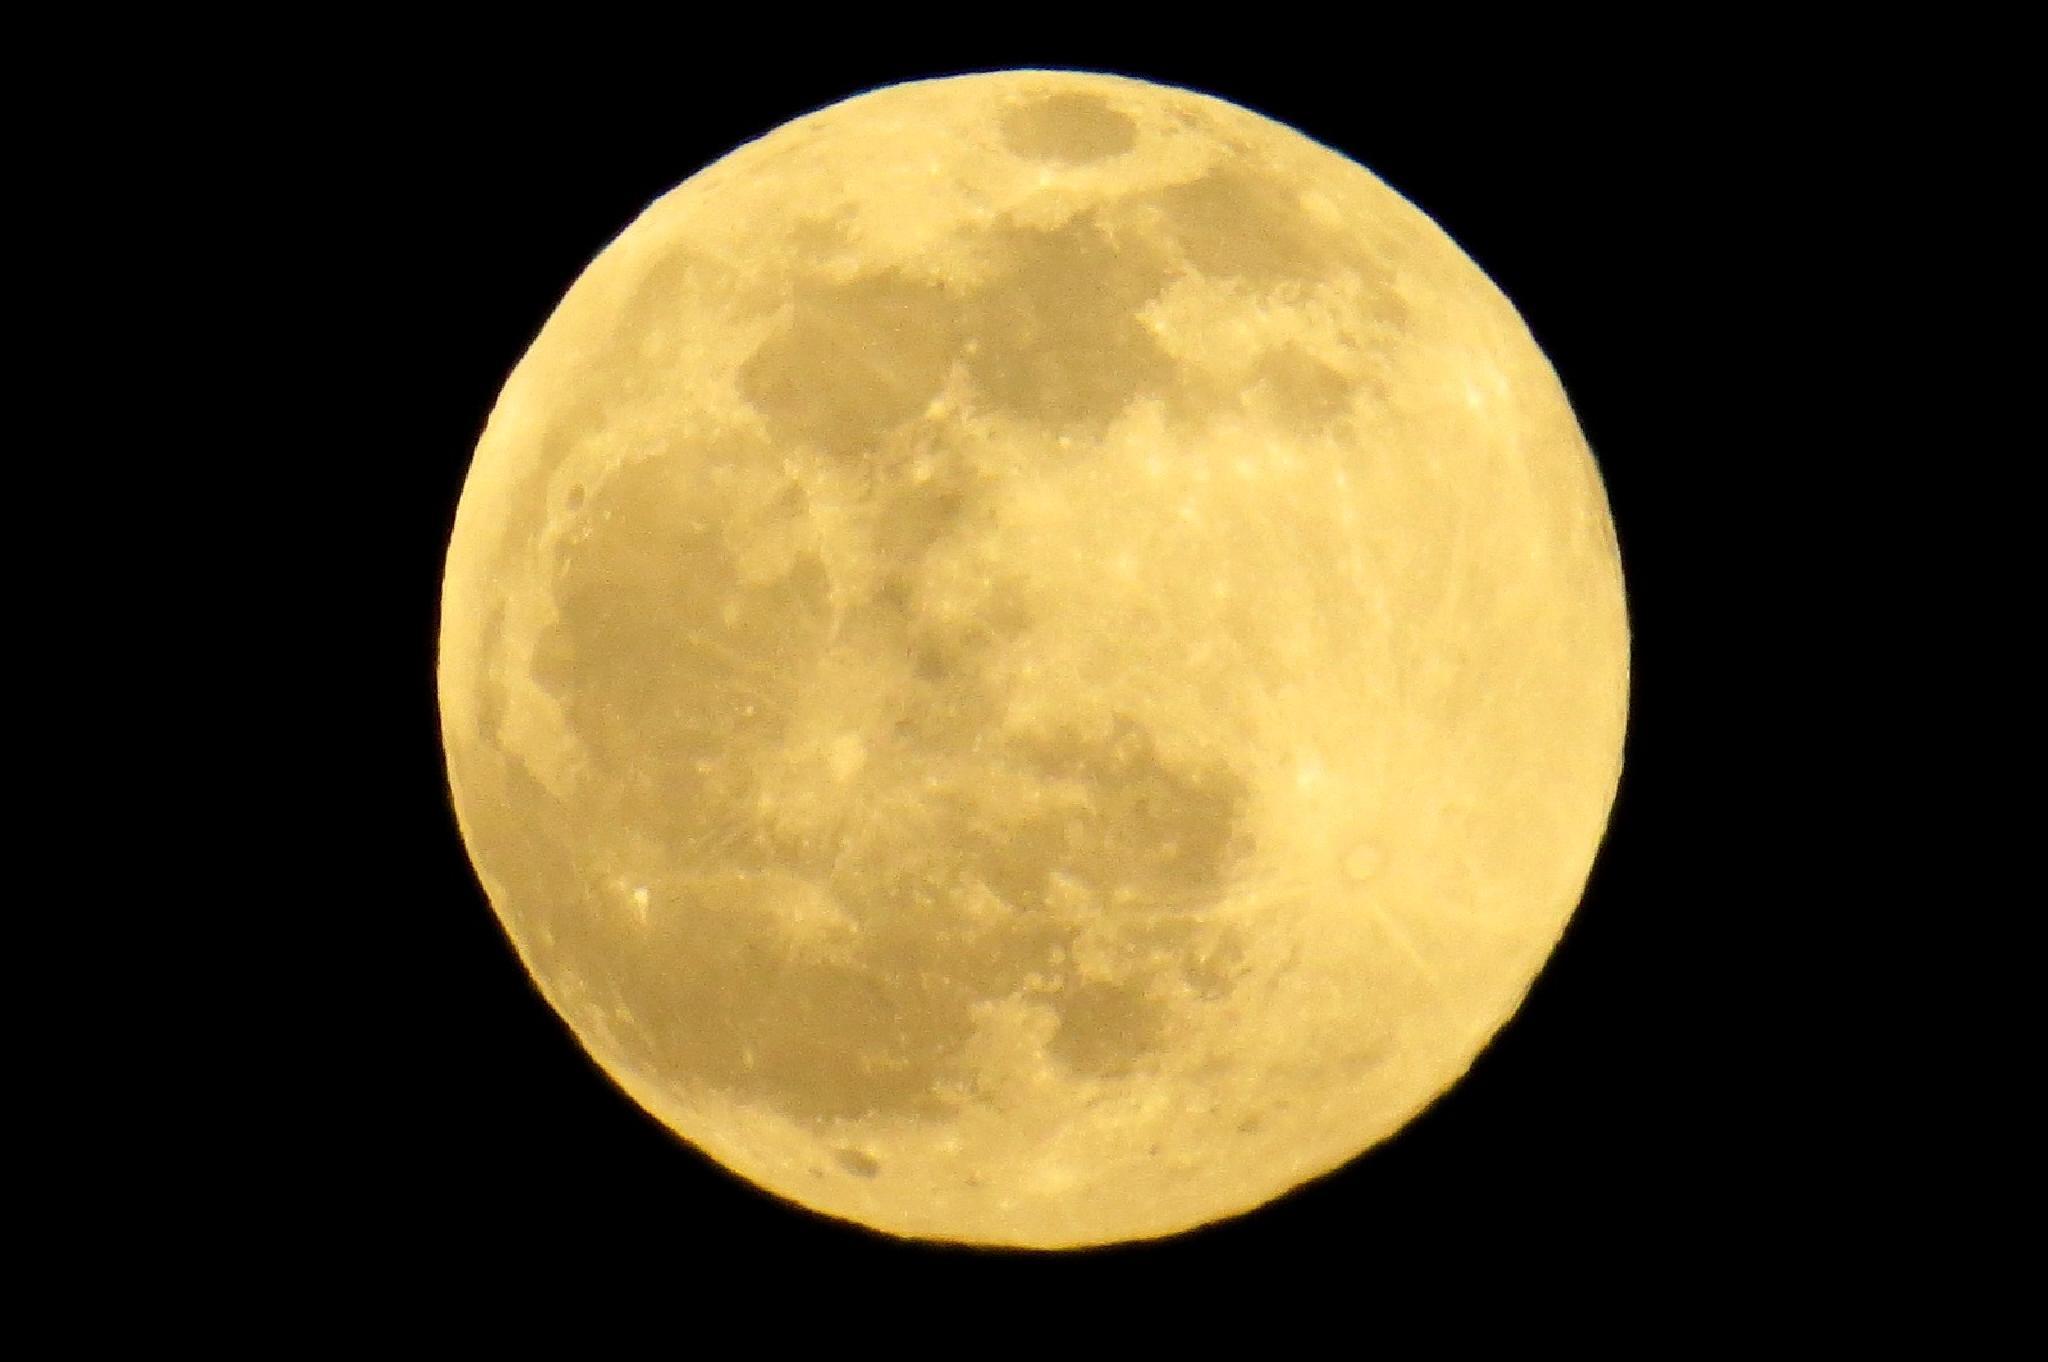 Full Moon by kkaine